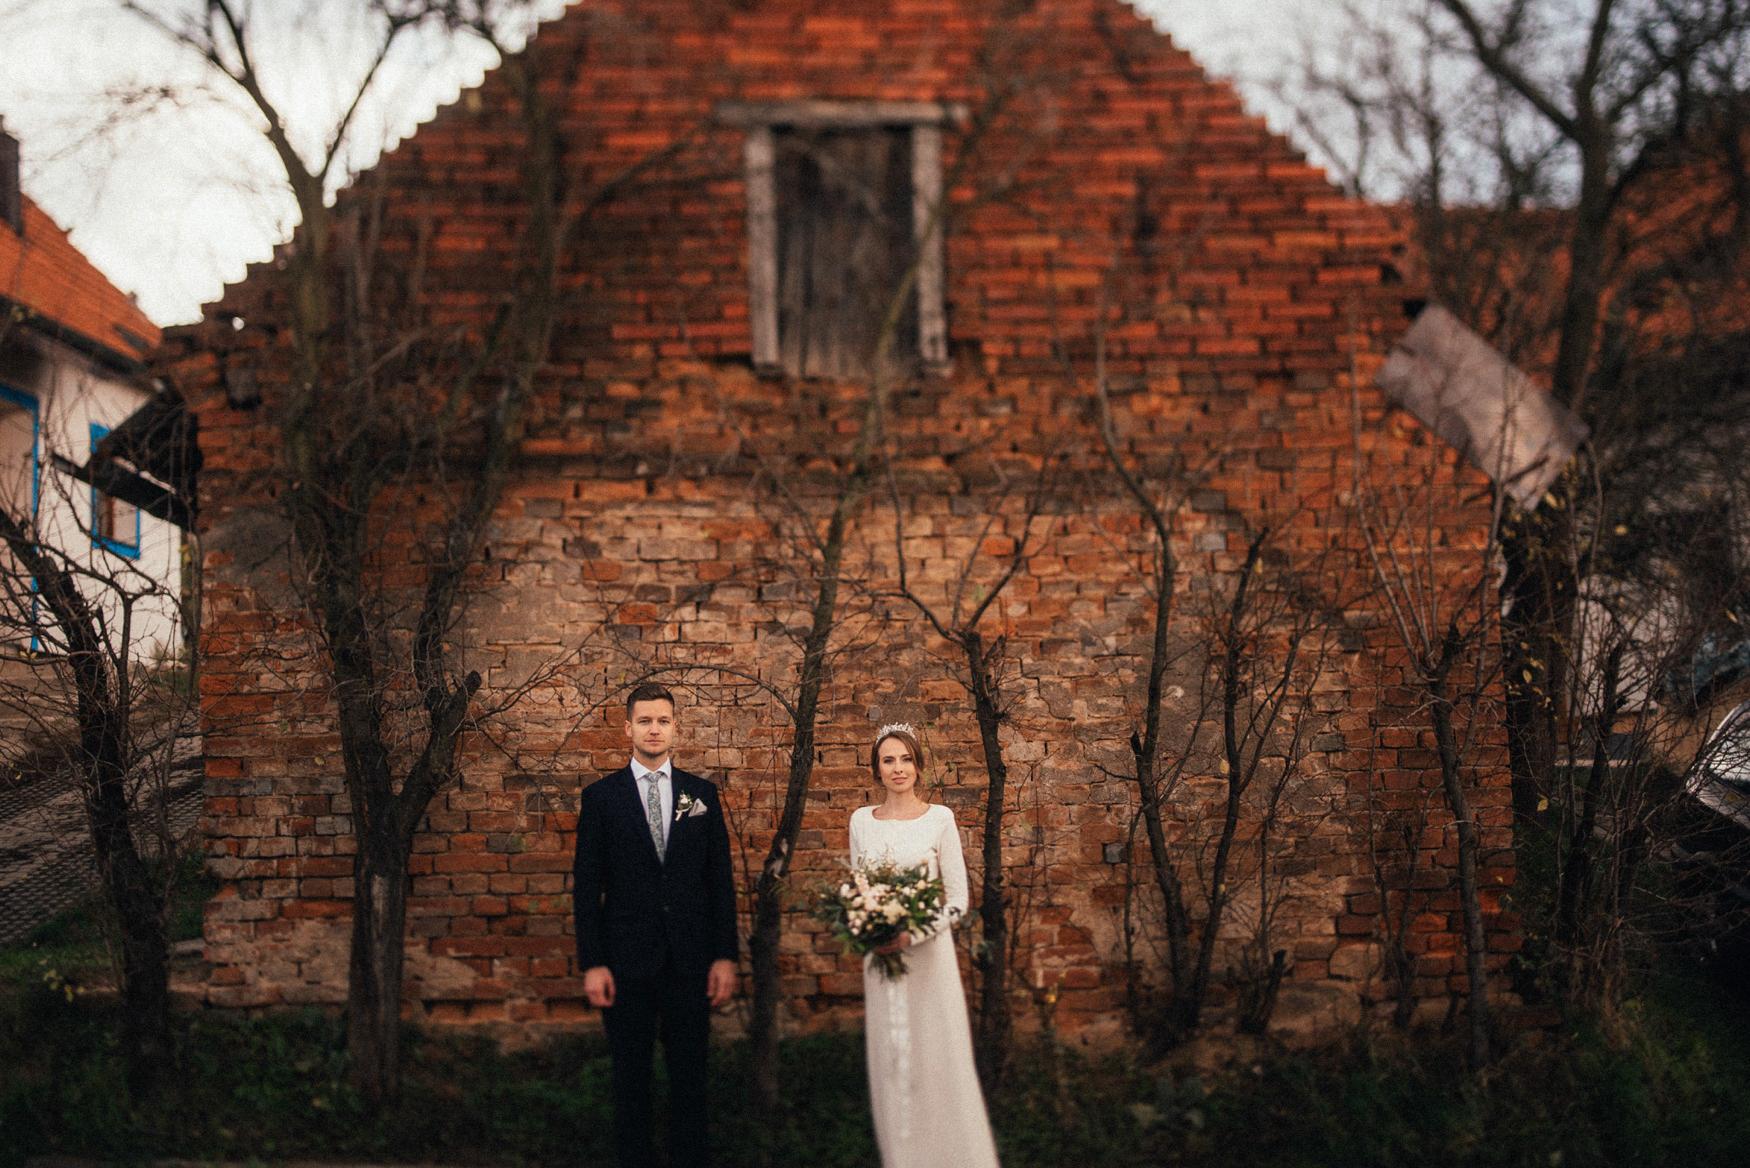 3 czech countryside rustic wedding - svatba zikmundov015.jpg